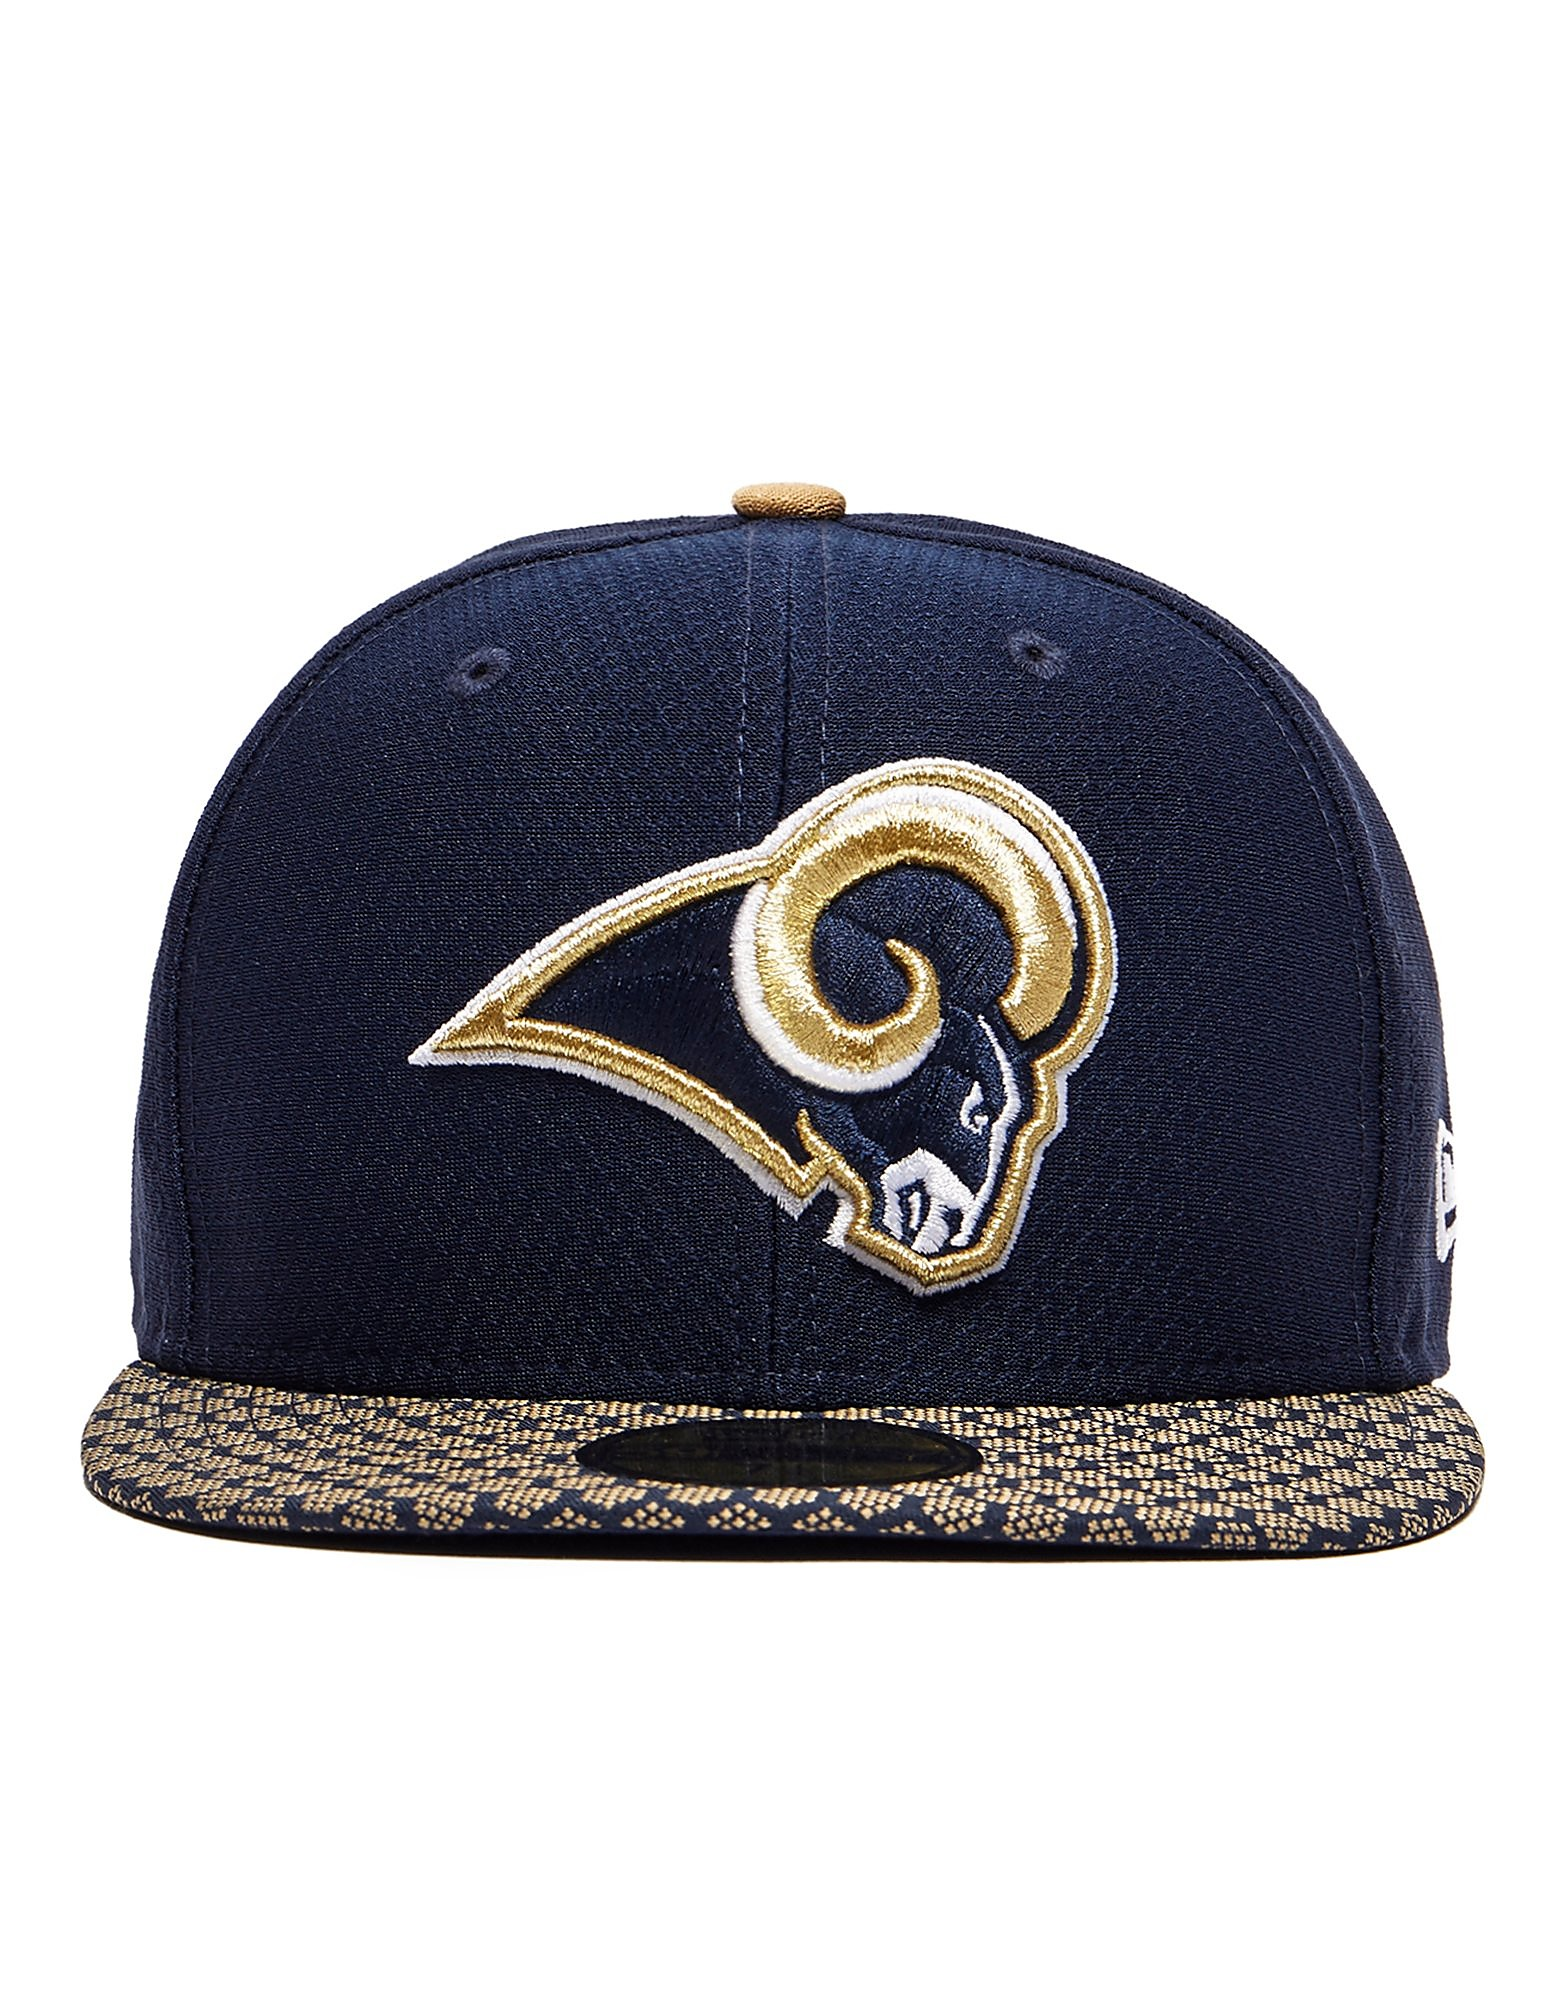 New Era Los Angeles Rams 59FIFTY Cap